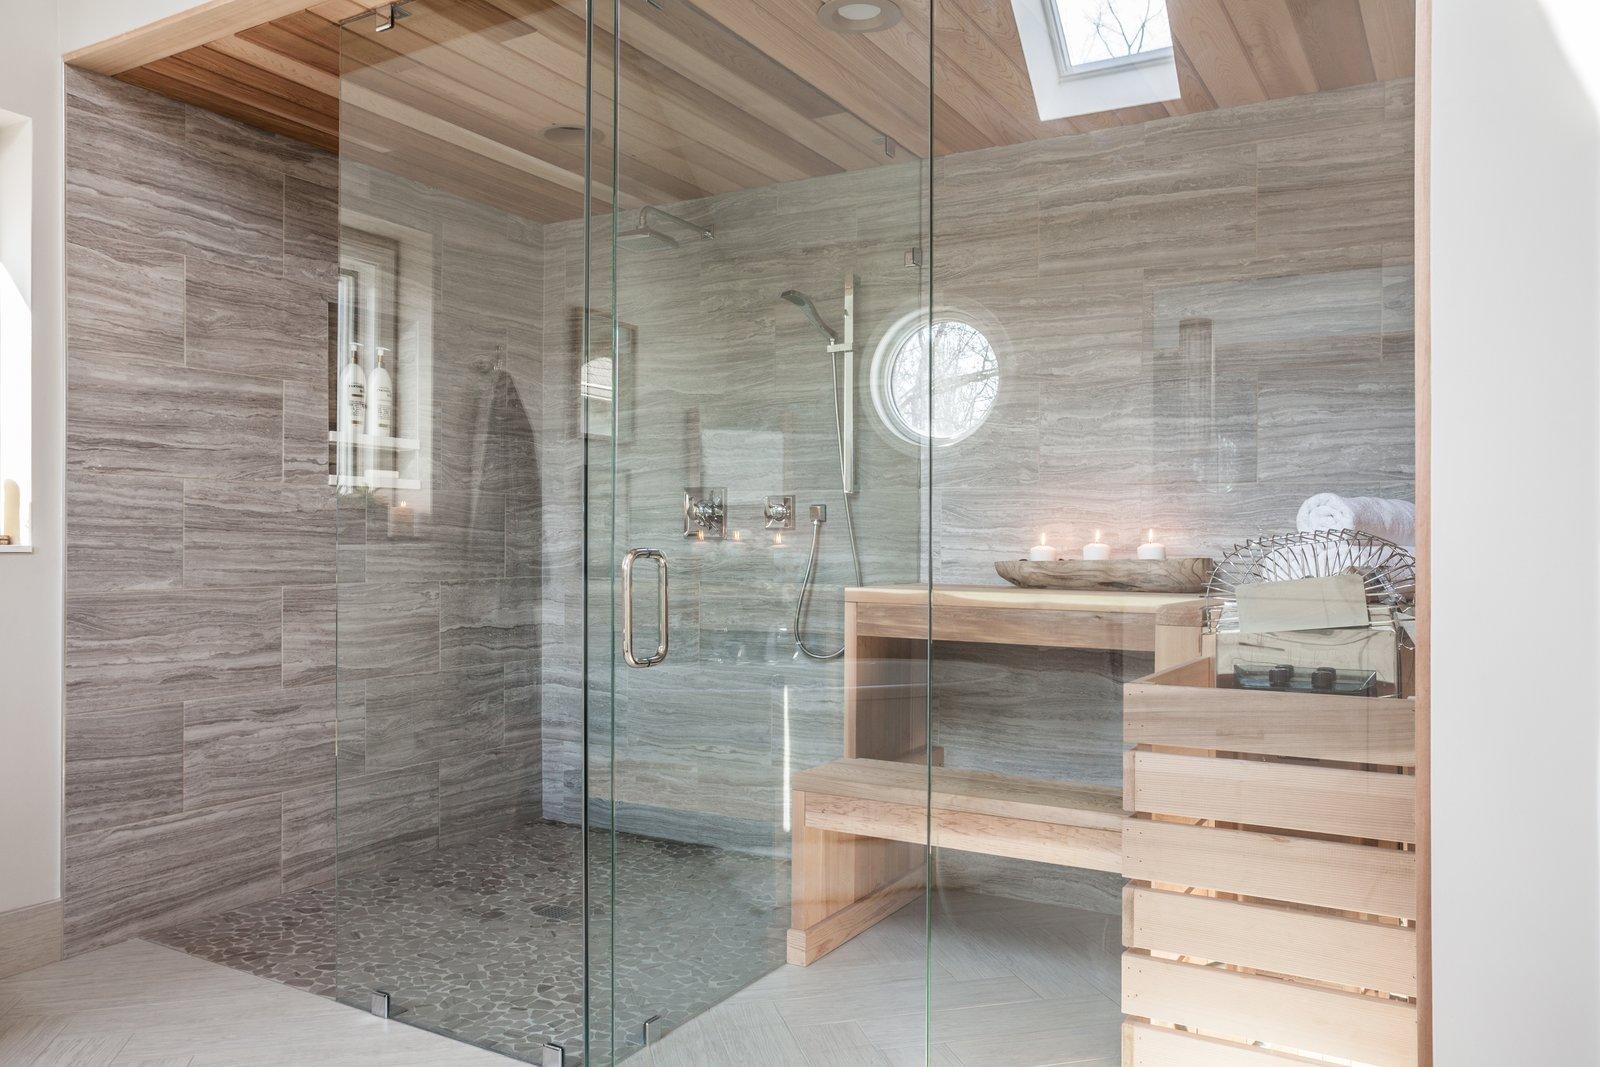 Bath Room, Wall Mount Sink, Freestanding Tub, and Open Shower  Ramsey Bathroom Remodel